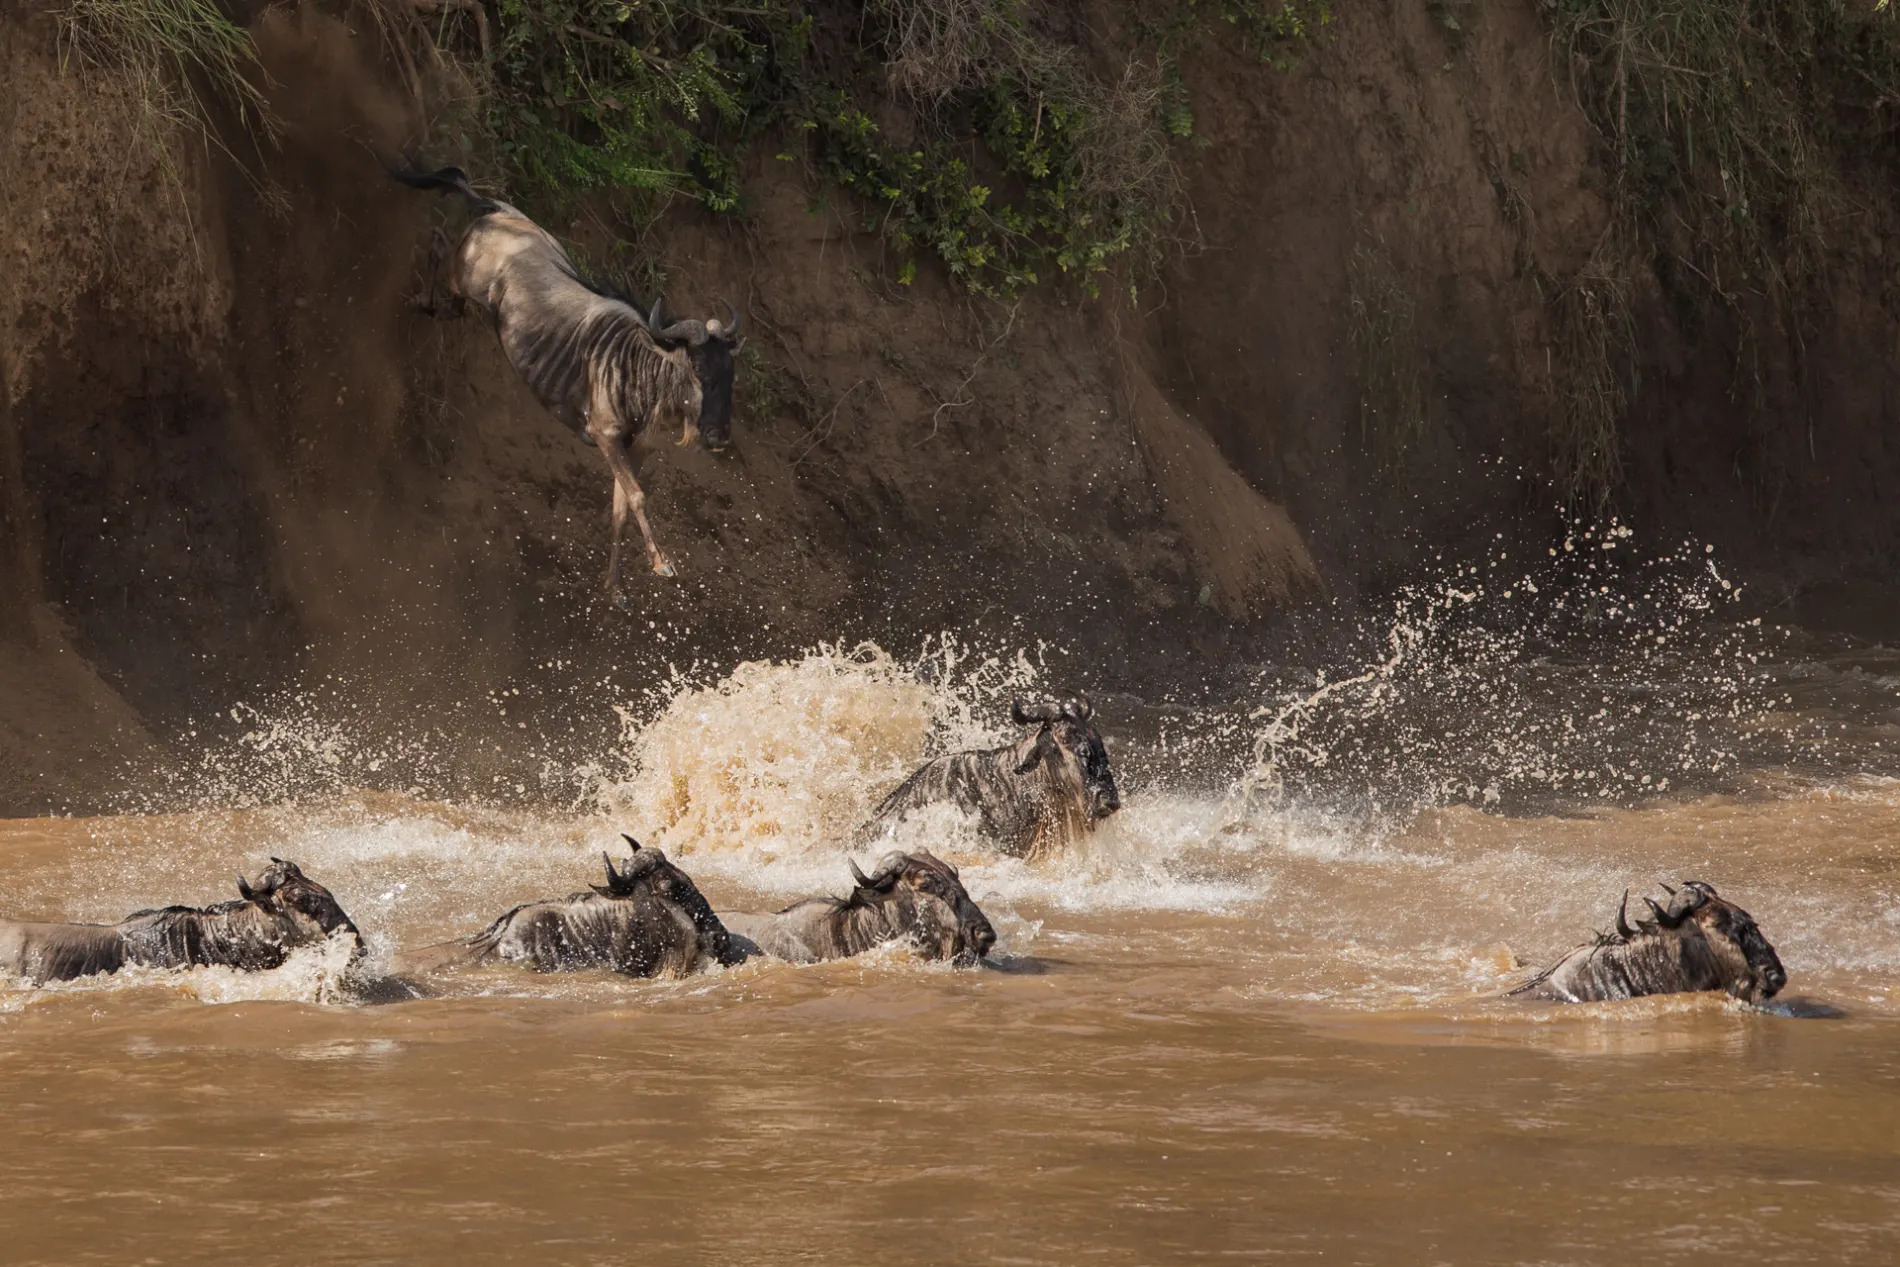 Mara river crossing 4